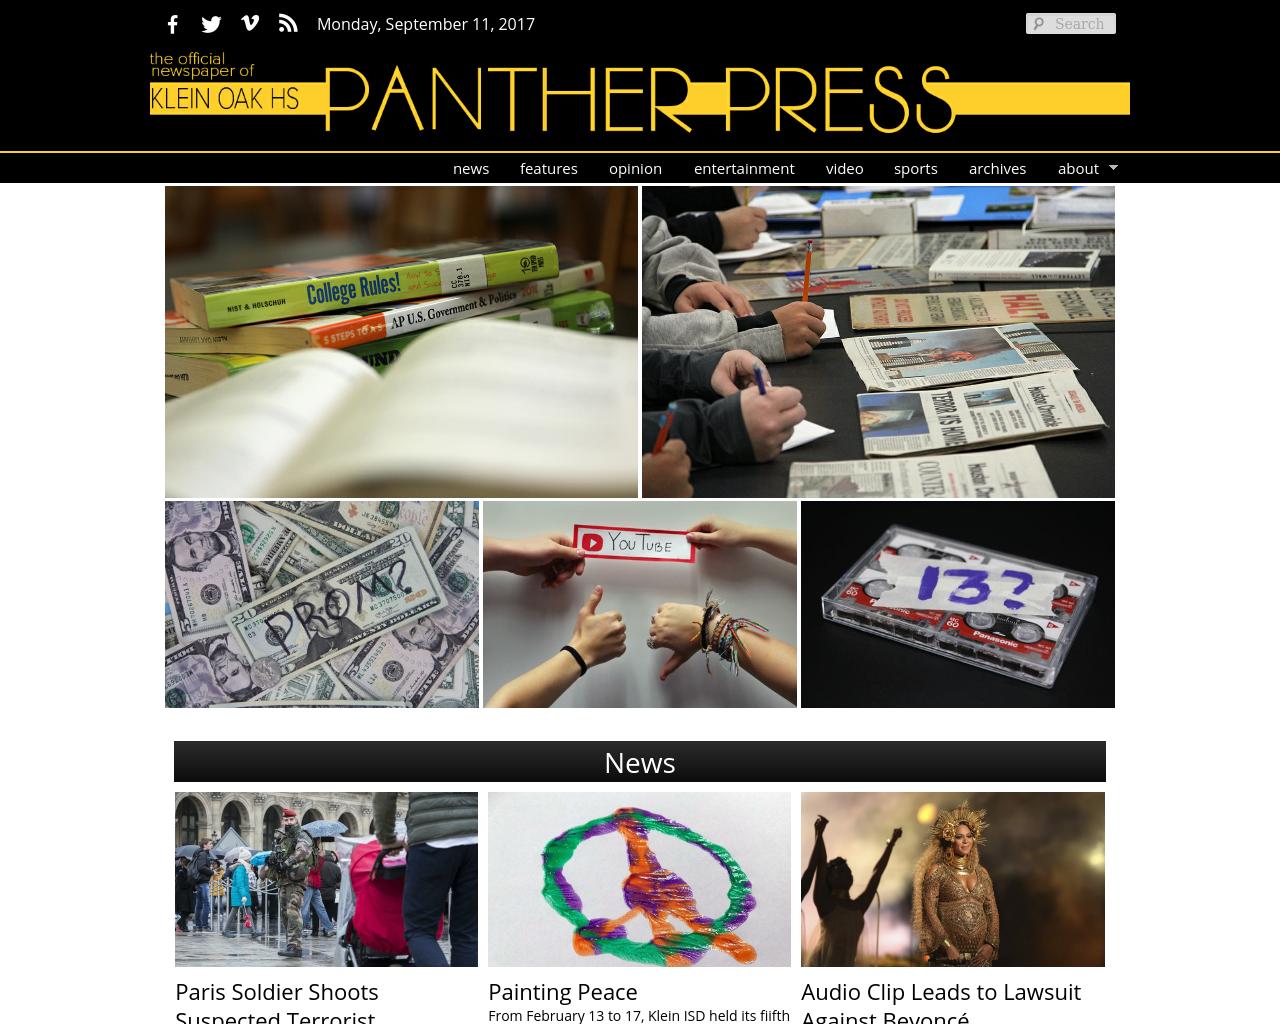 Panther-Press-Online-Advertising-Reviews-Pricing